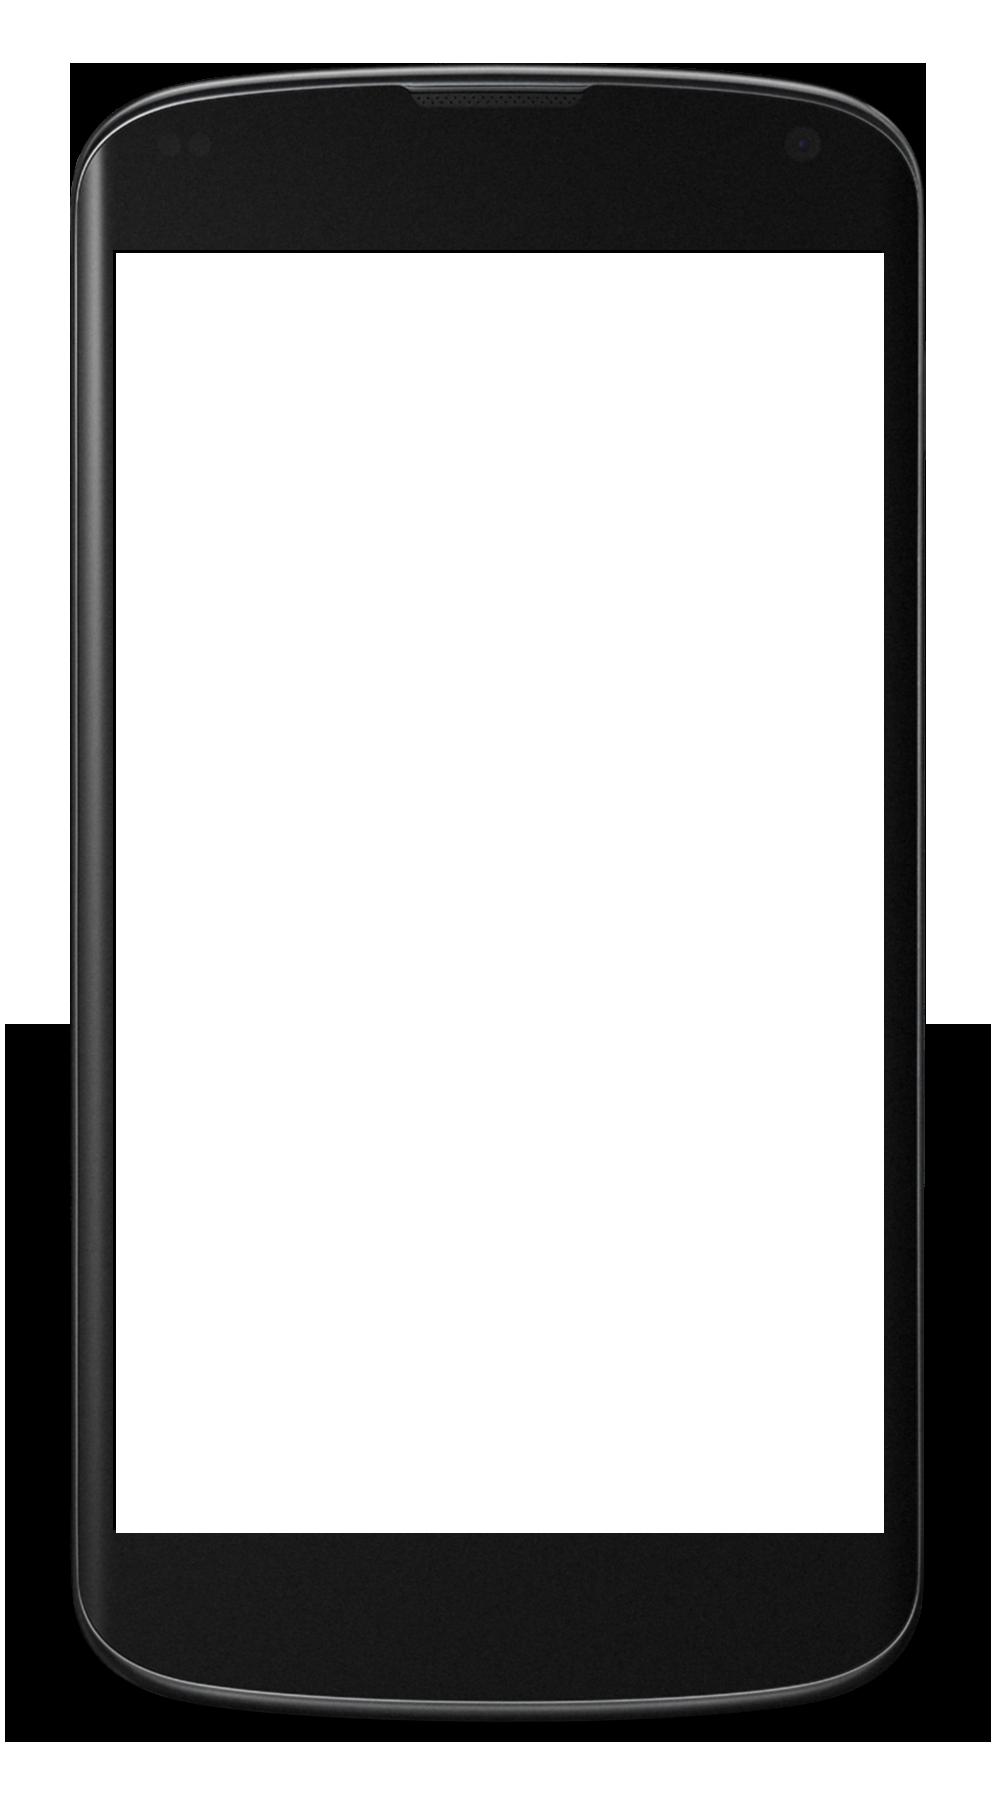 mac compatible wireless digital photo frame lFf